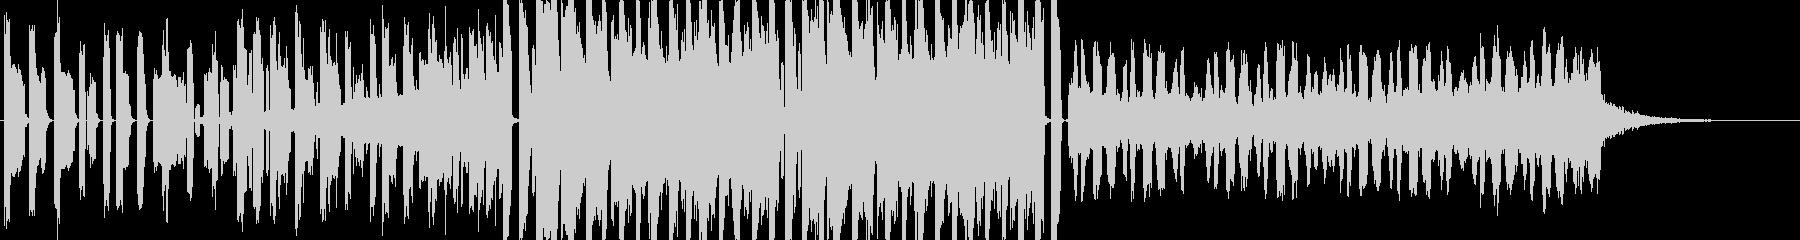 CM,エンディング用エレクトロの未再生の波形